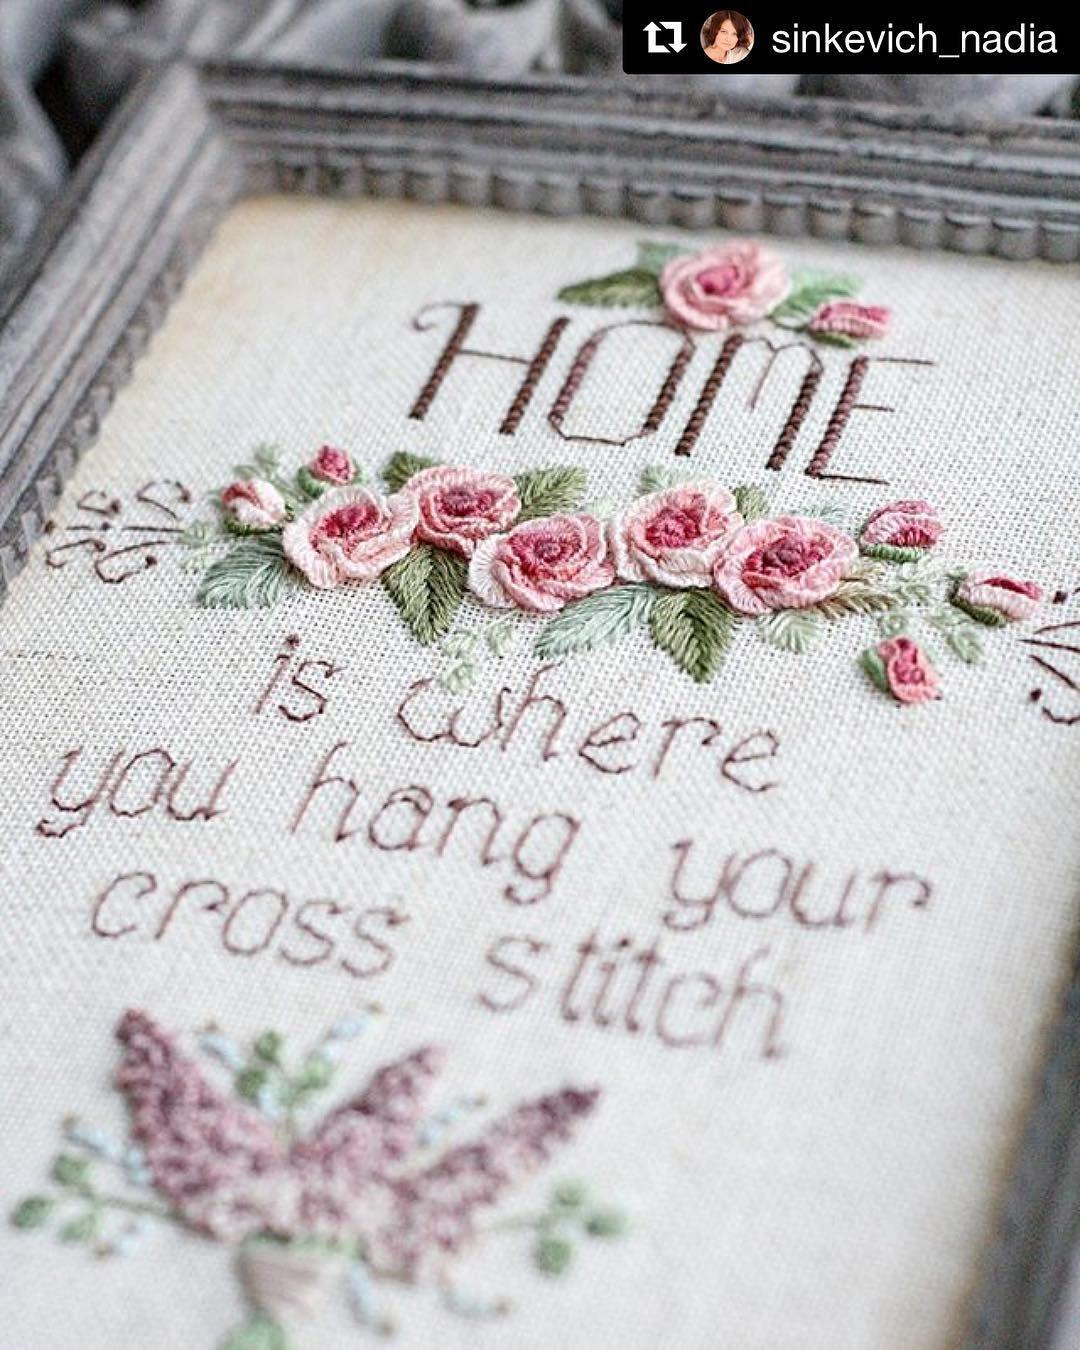 @sinkevich_nadia #handembroidery #needlework #ricamo #broderie #embroidery #bordado